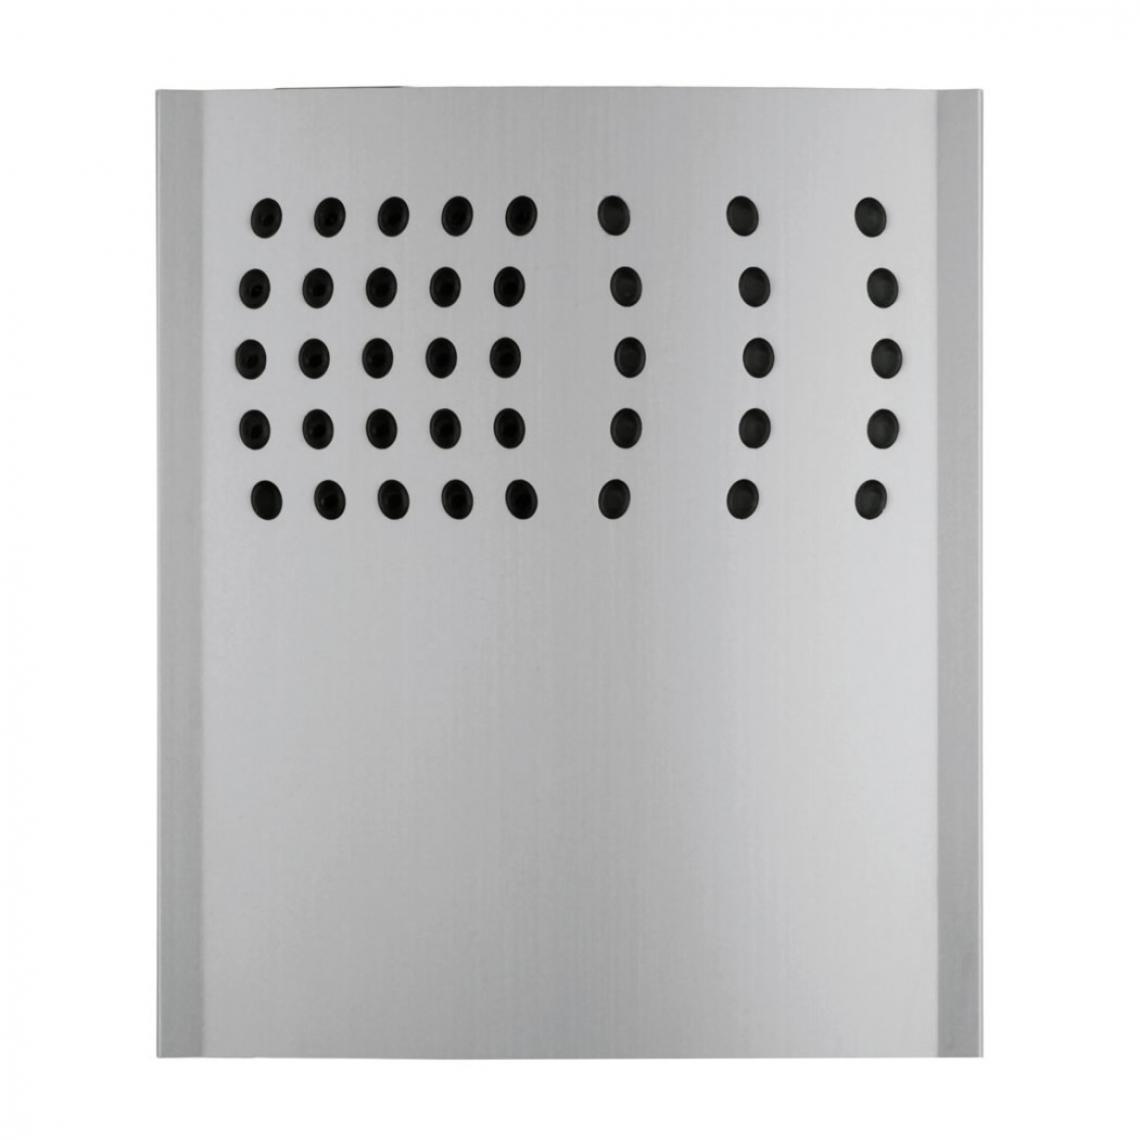 Posto esterno audio DUO SYSTEM - AD2120CPL